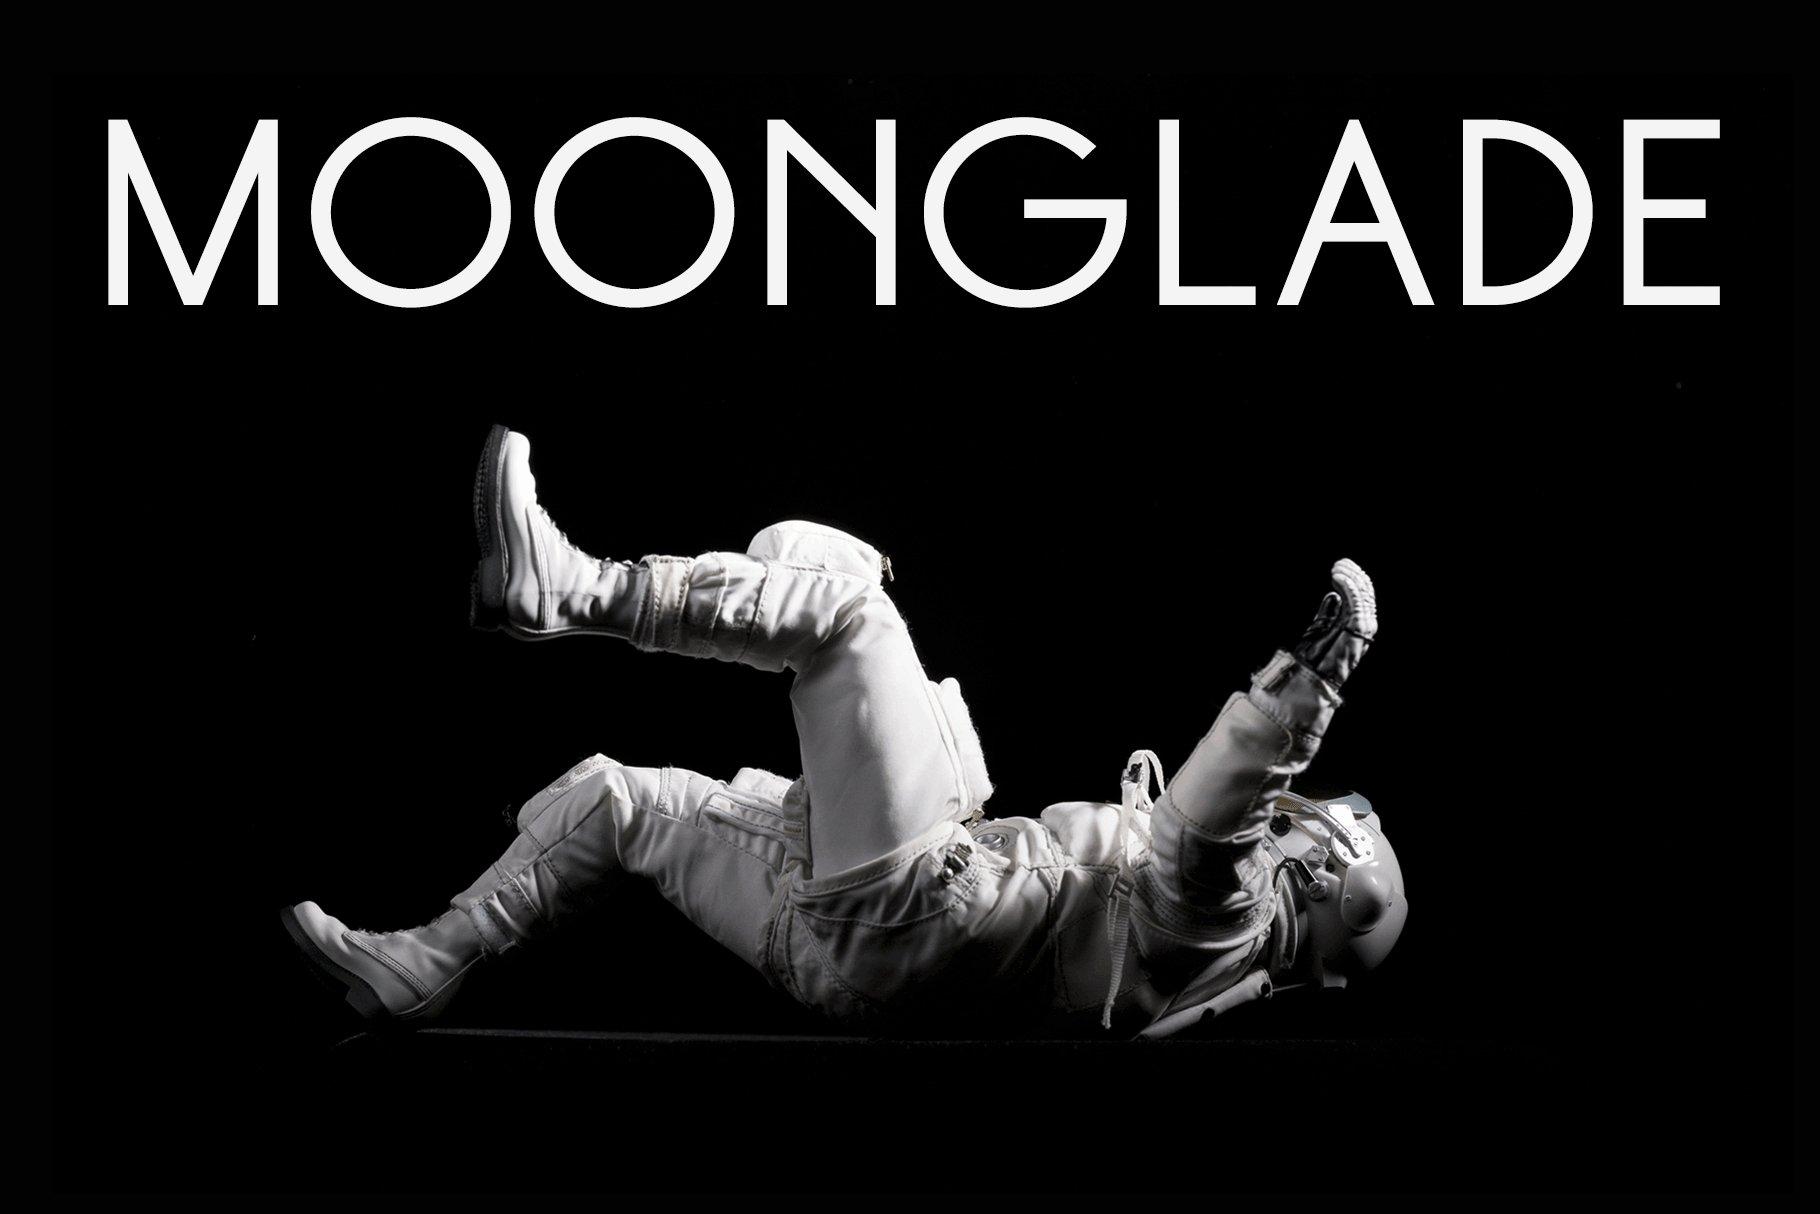 Moonglade-Sans-Serif-Font-www.mockuphill.com